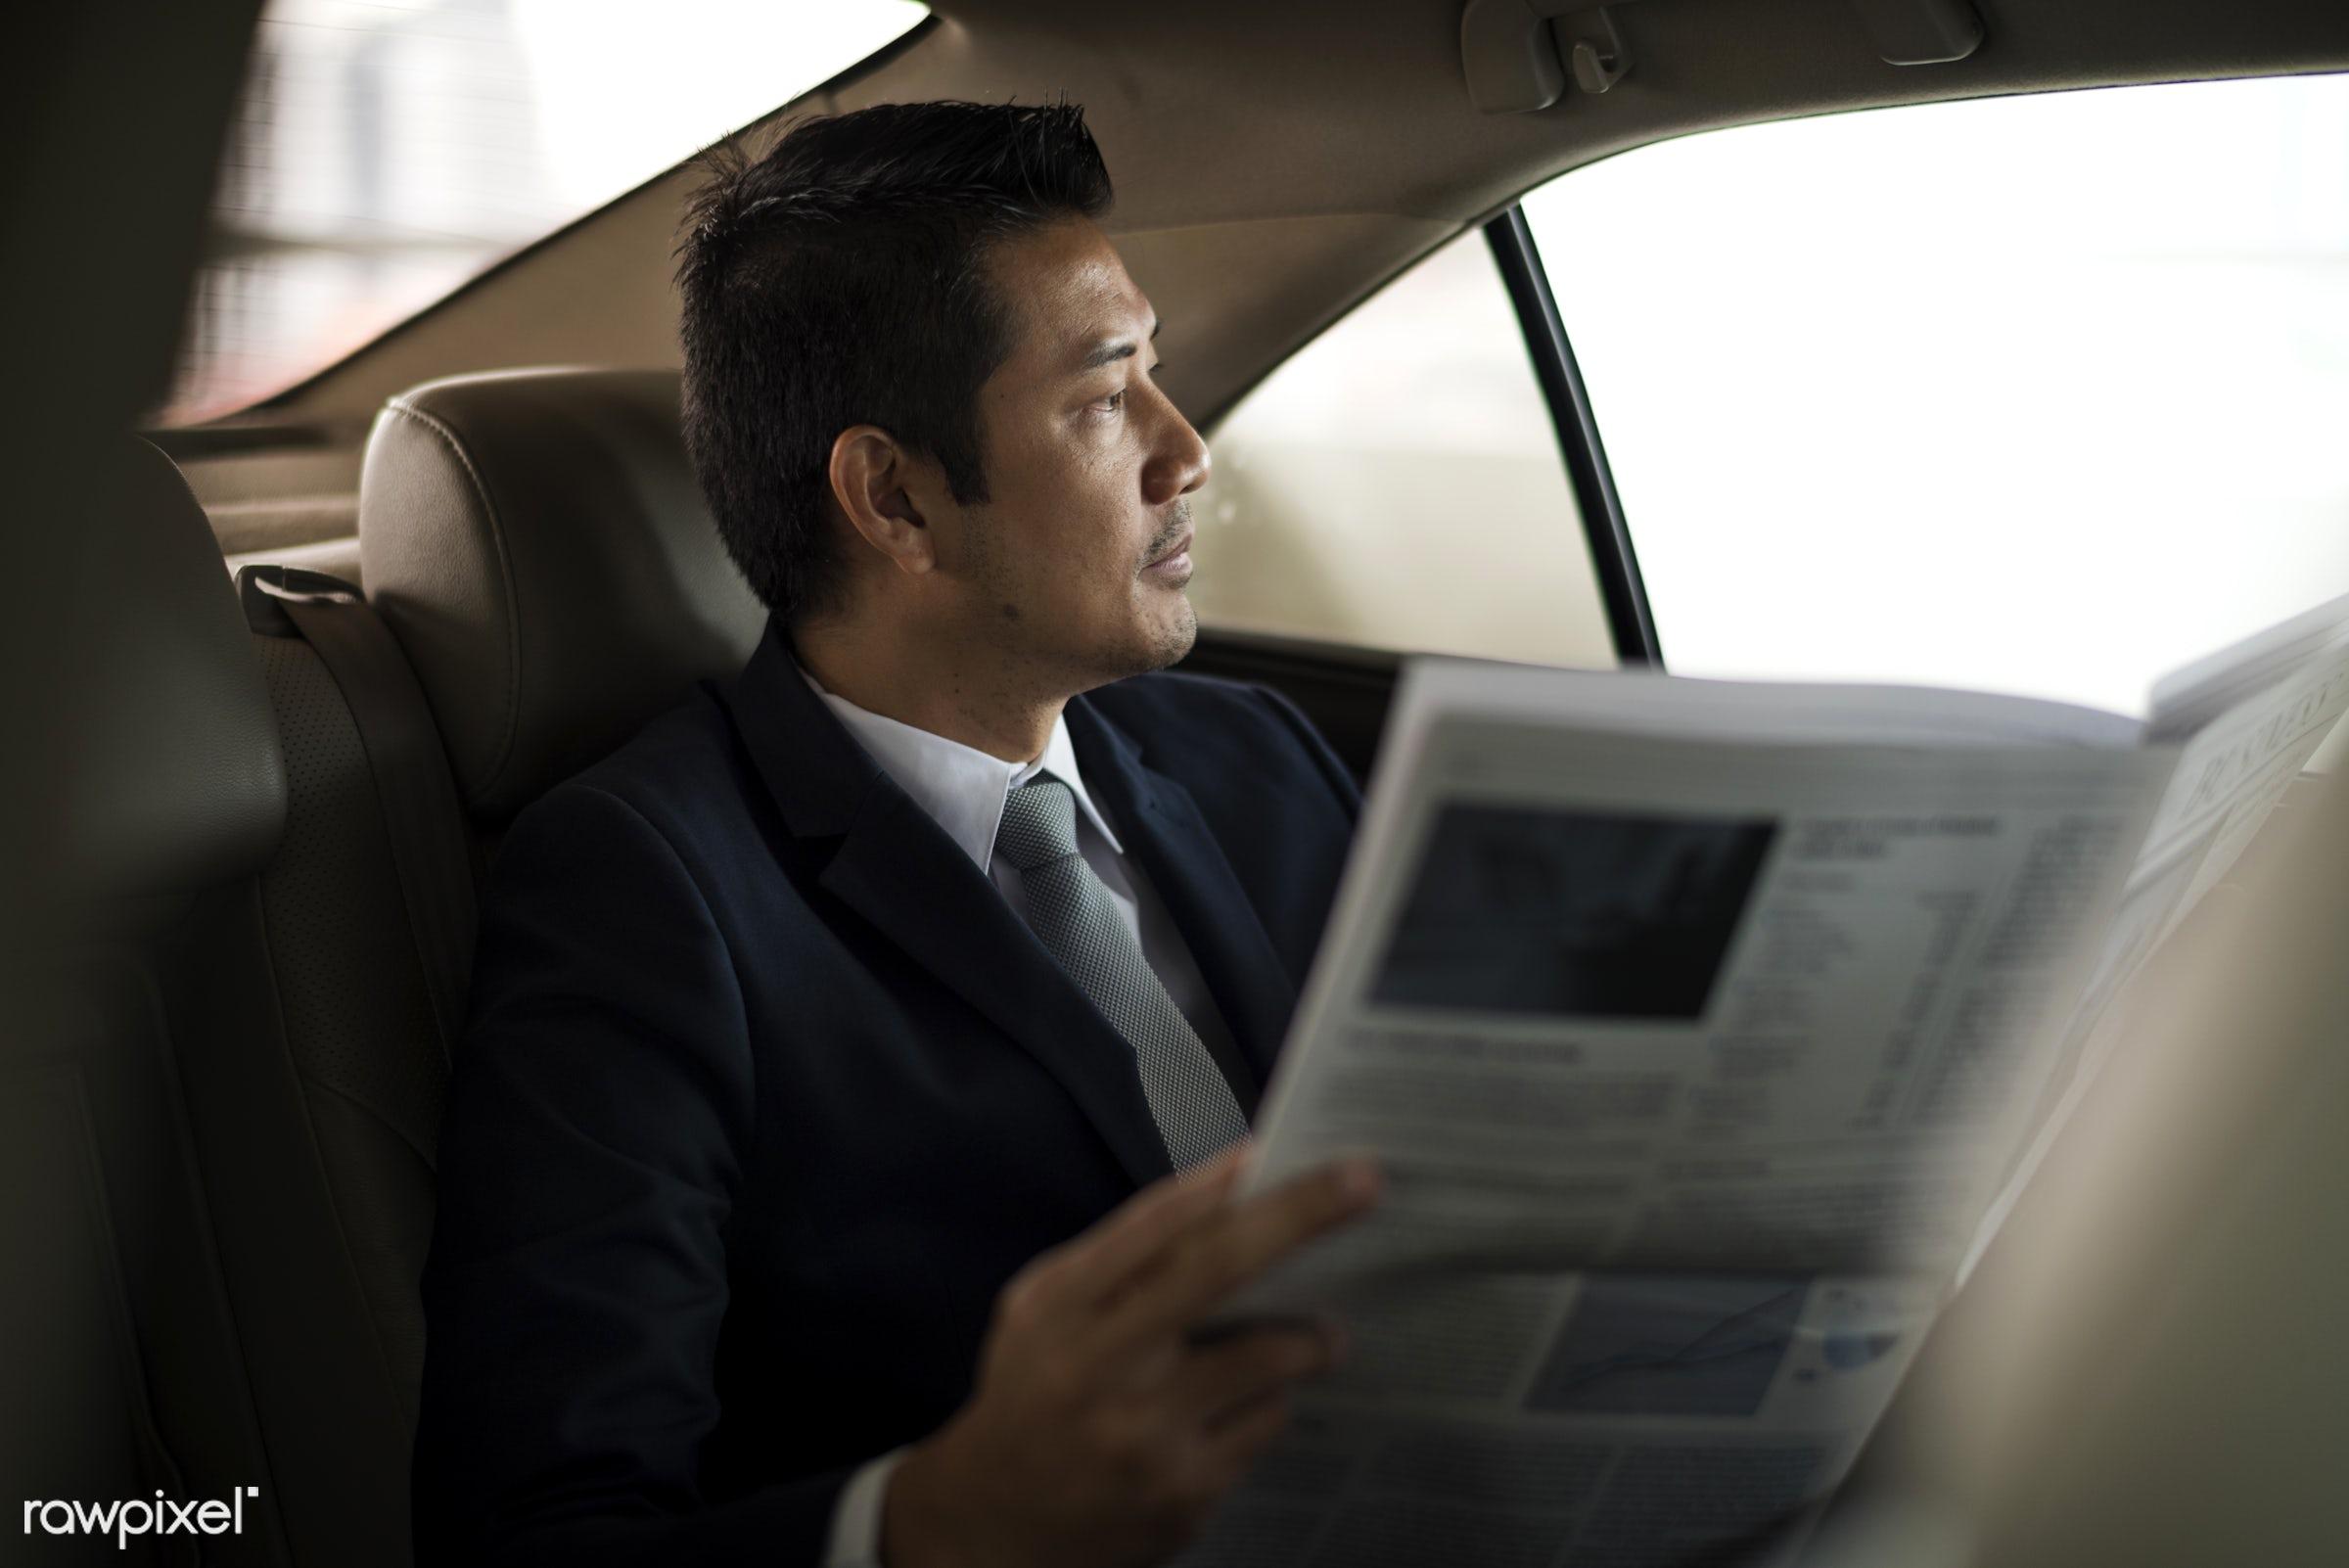 news, breaking news, newspaper, reading, adult, back seat, break, business, businessman, businessmen, candid, car,...